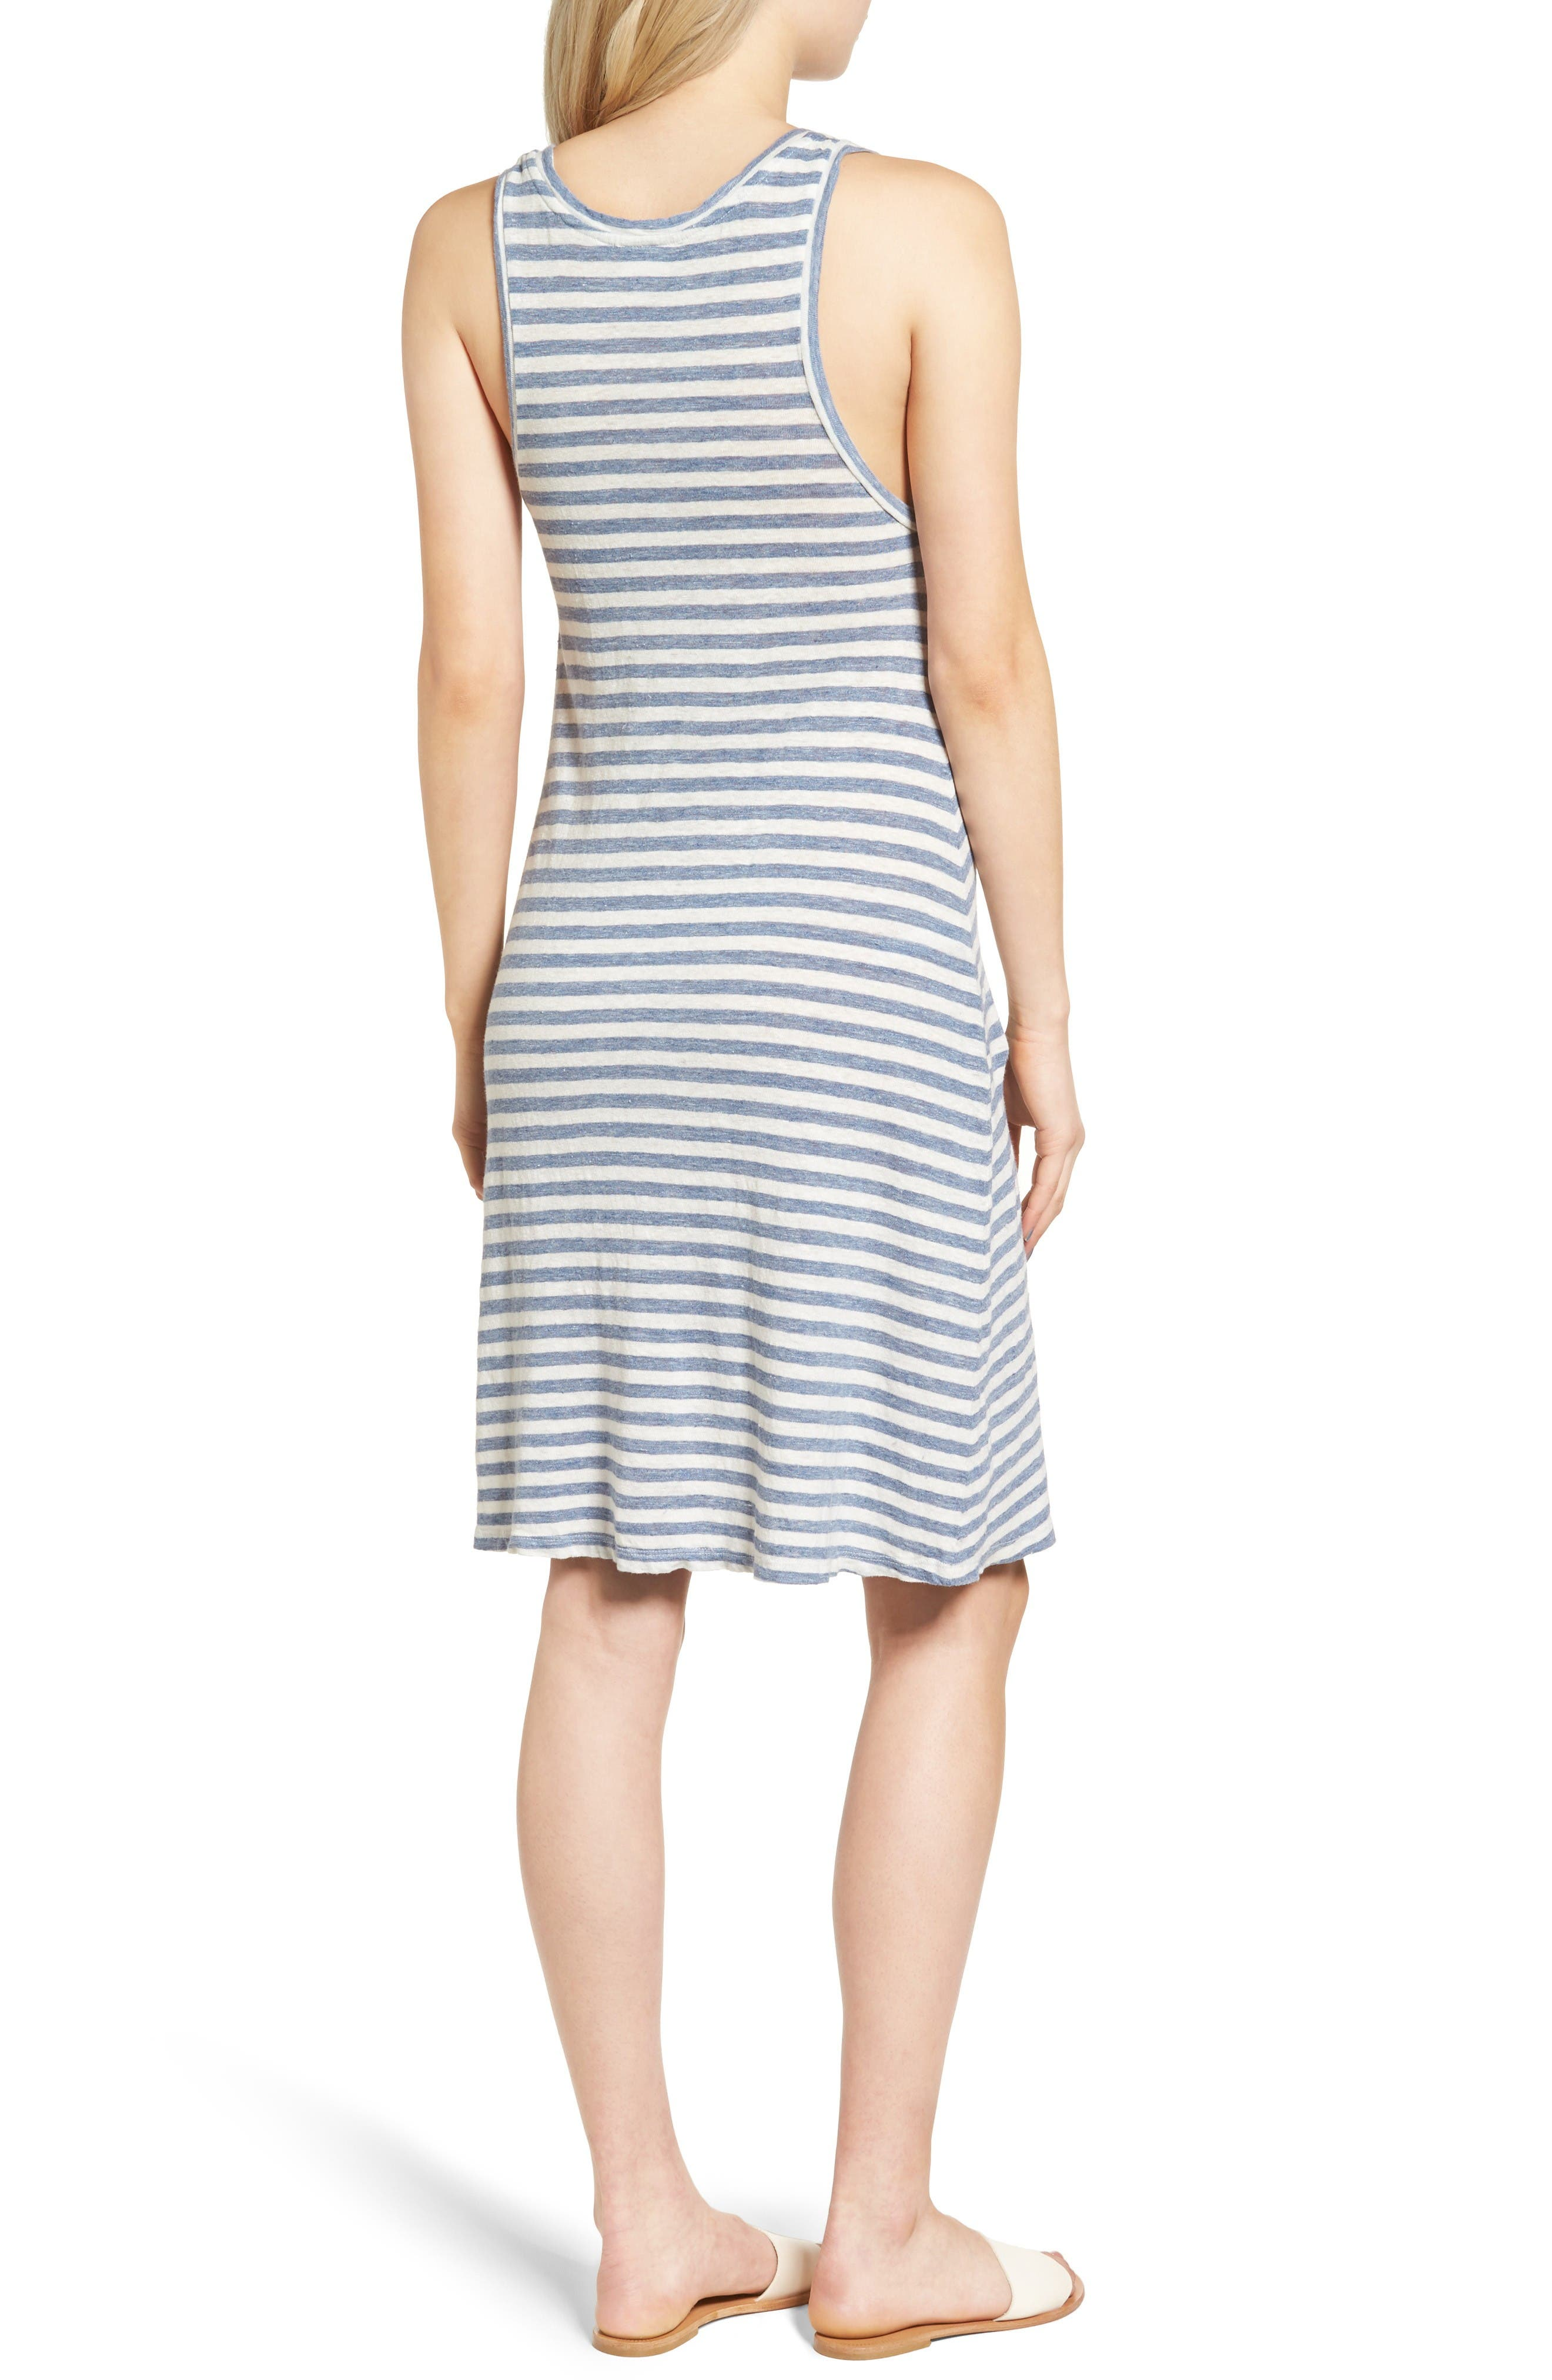 Avril Linen Tank Dress,                             Alternate thumbnail 2, color,                             Heather Blue/ Powder White